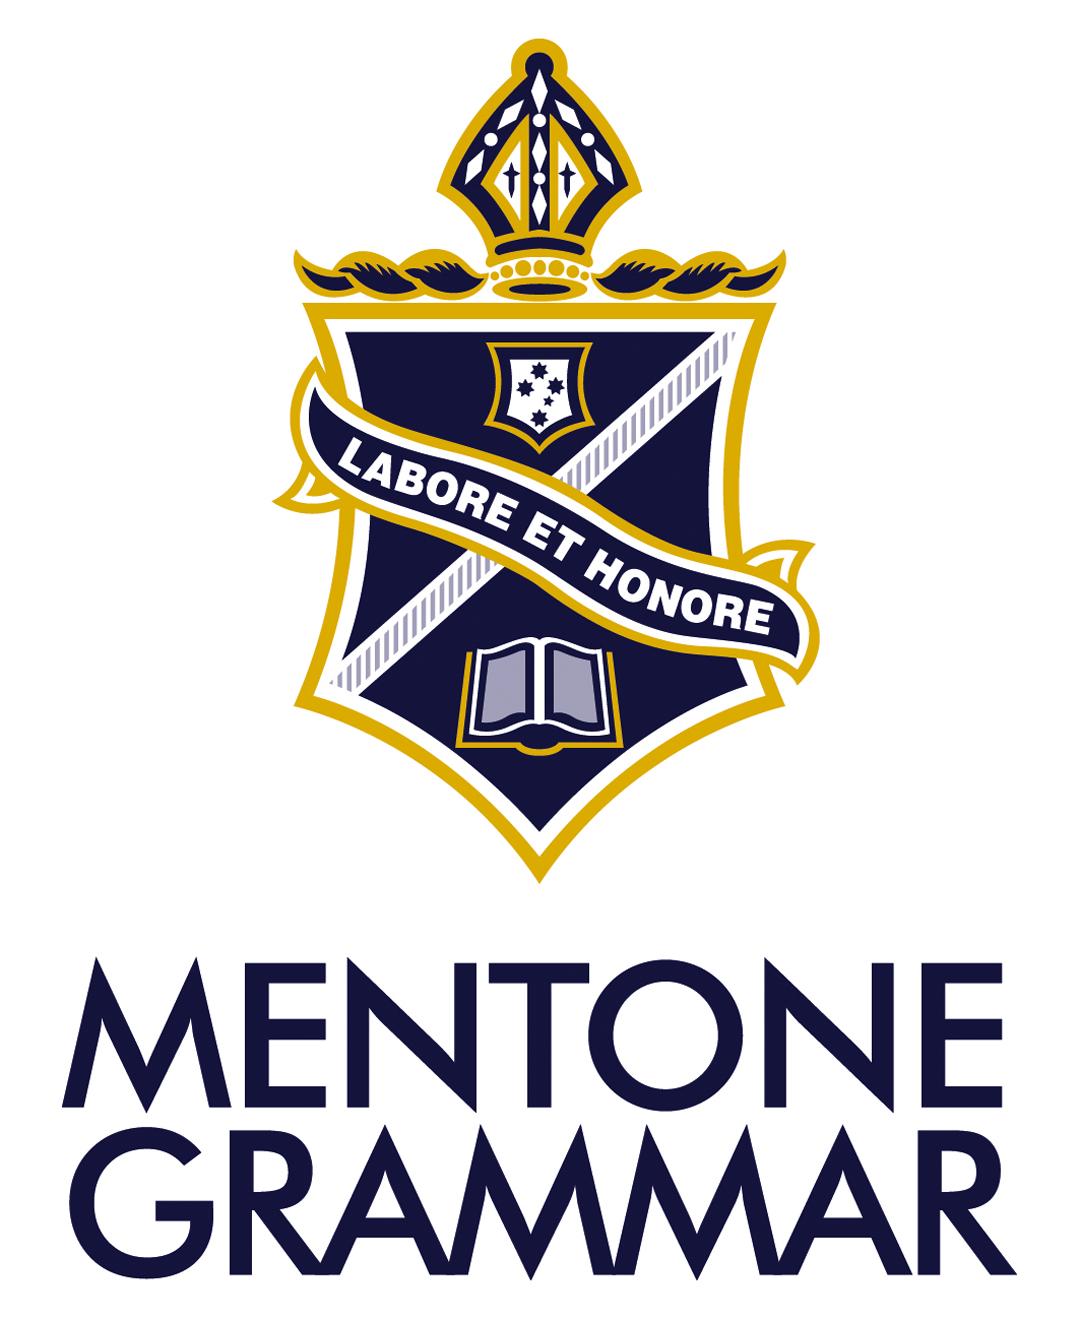 MENTONE GRAMMAR - MELBOURNE - AUSTRALIA